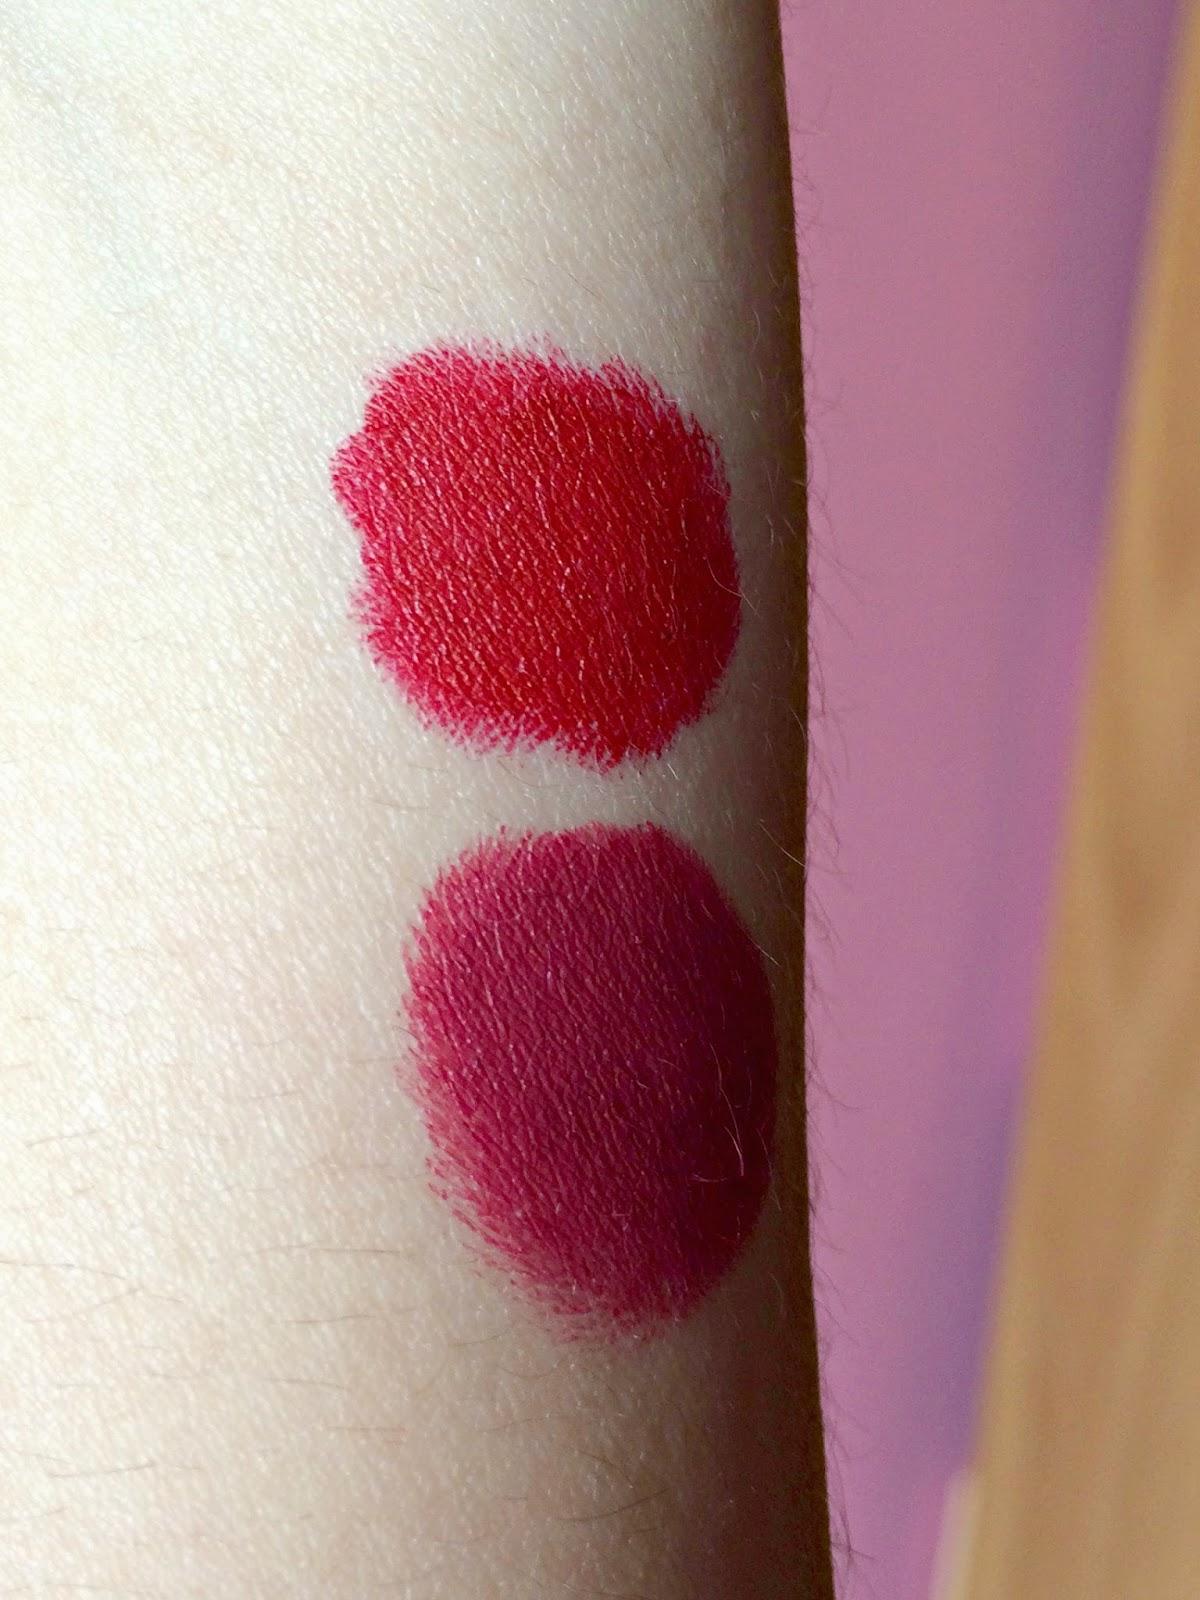 beauty product review bubblybeauty.com